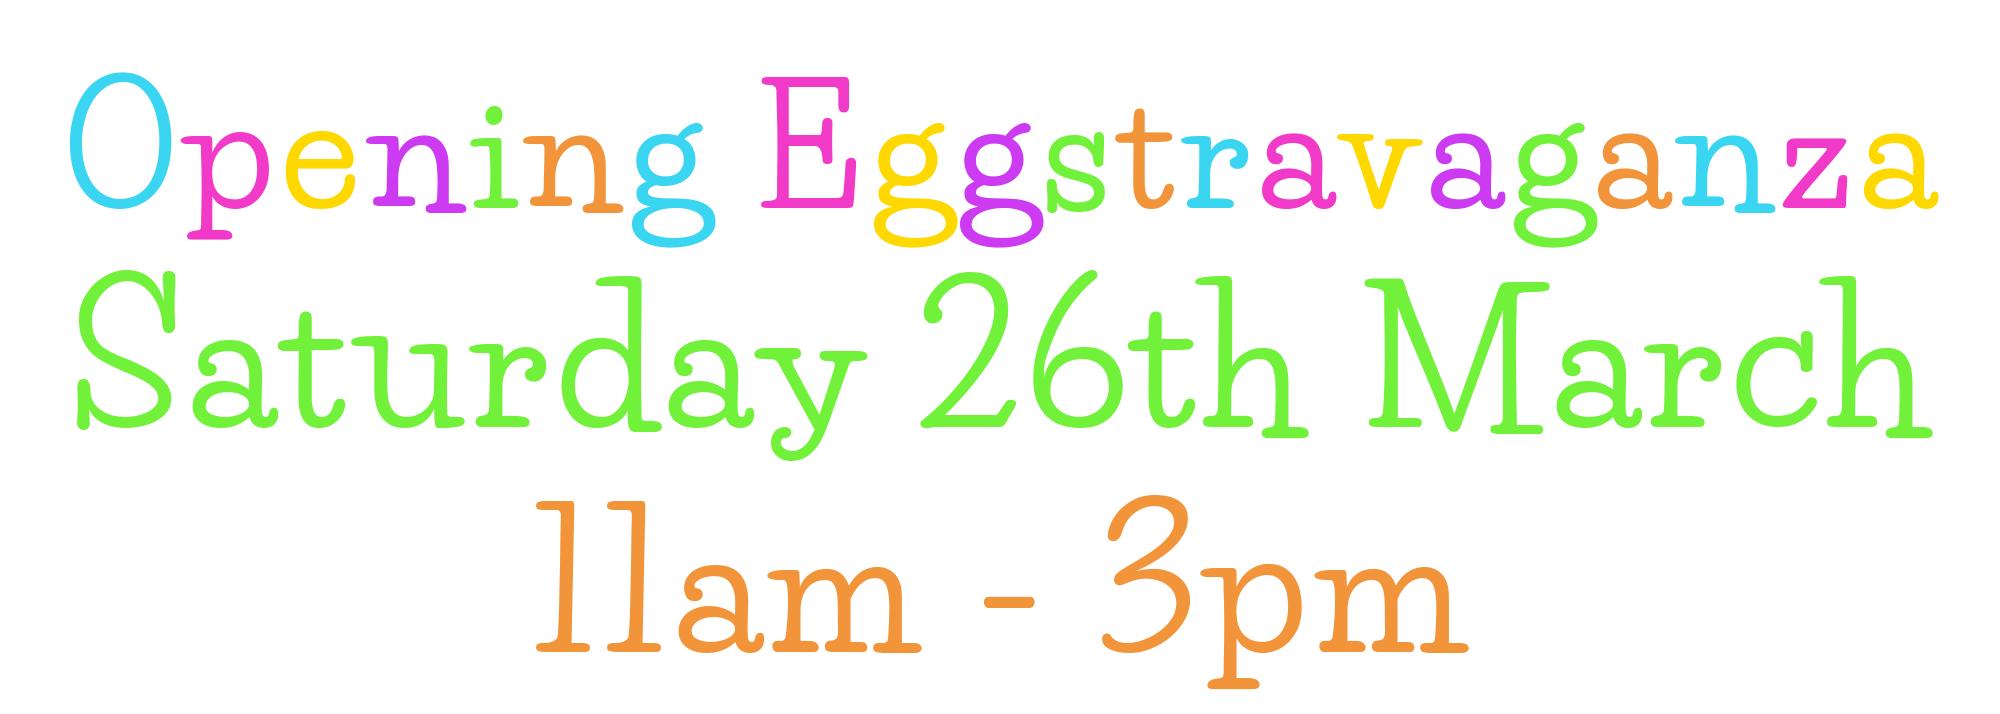 Opening Eggstravaganza